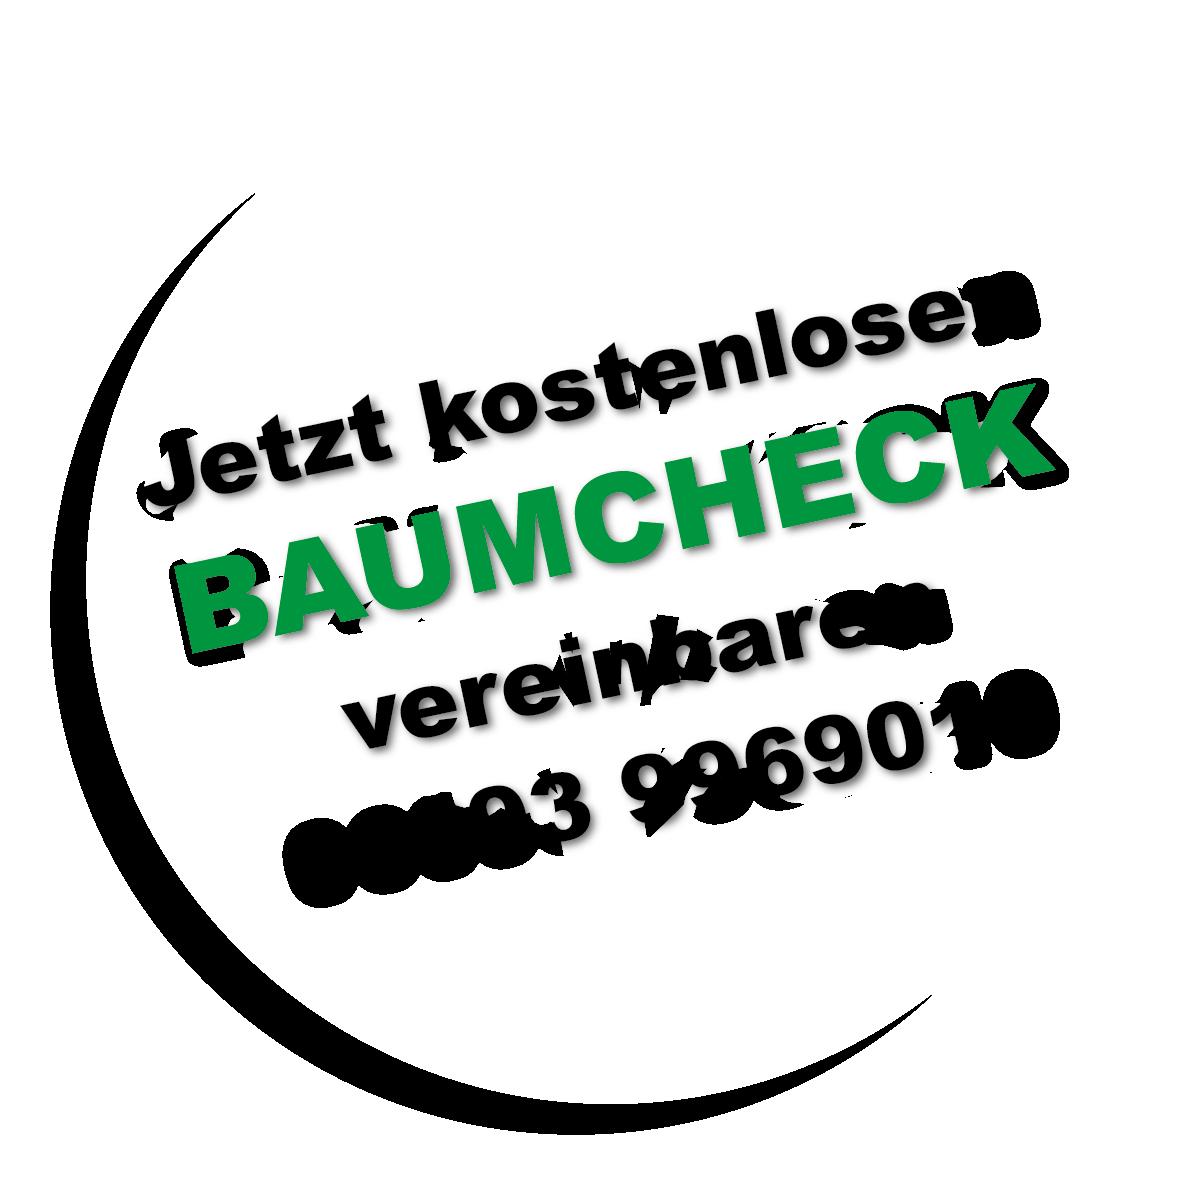 Baumkontrolle Baumcheck Baumdienst Gerber